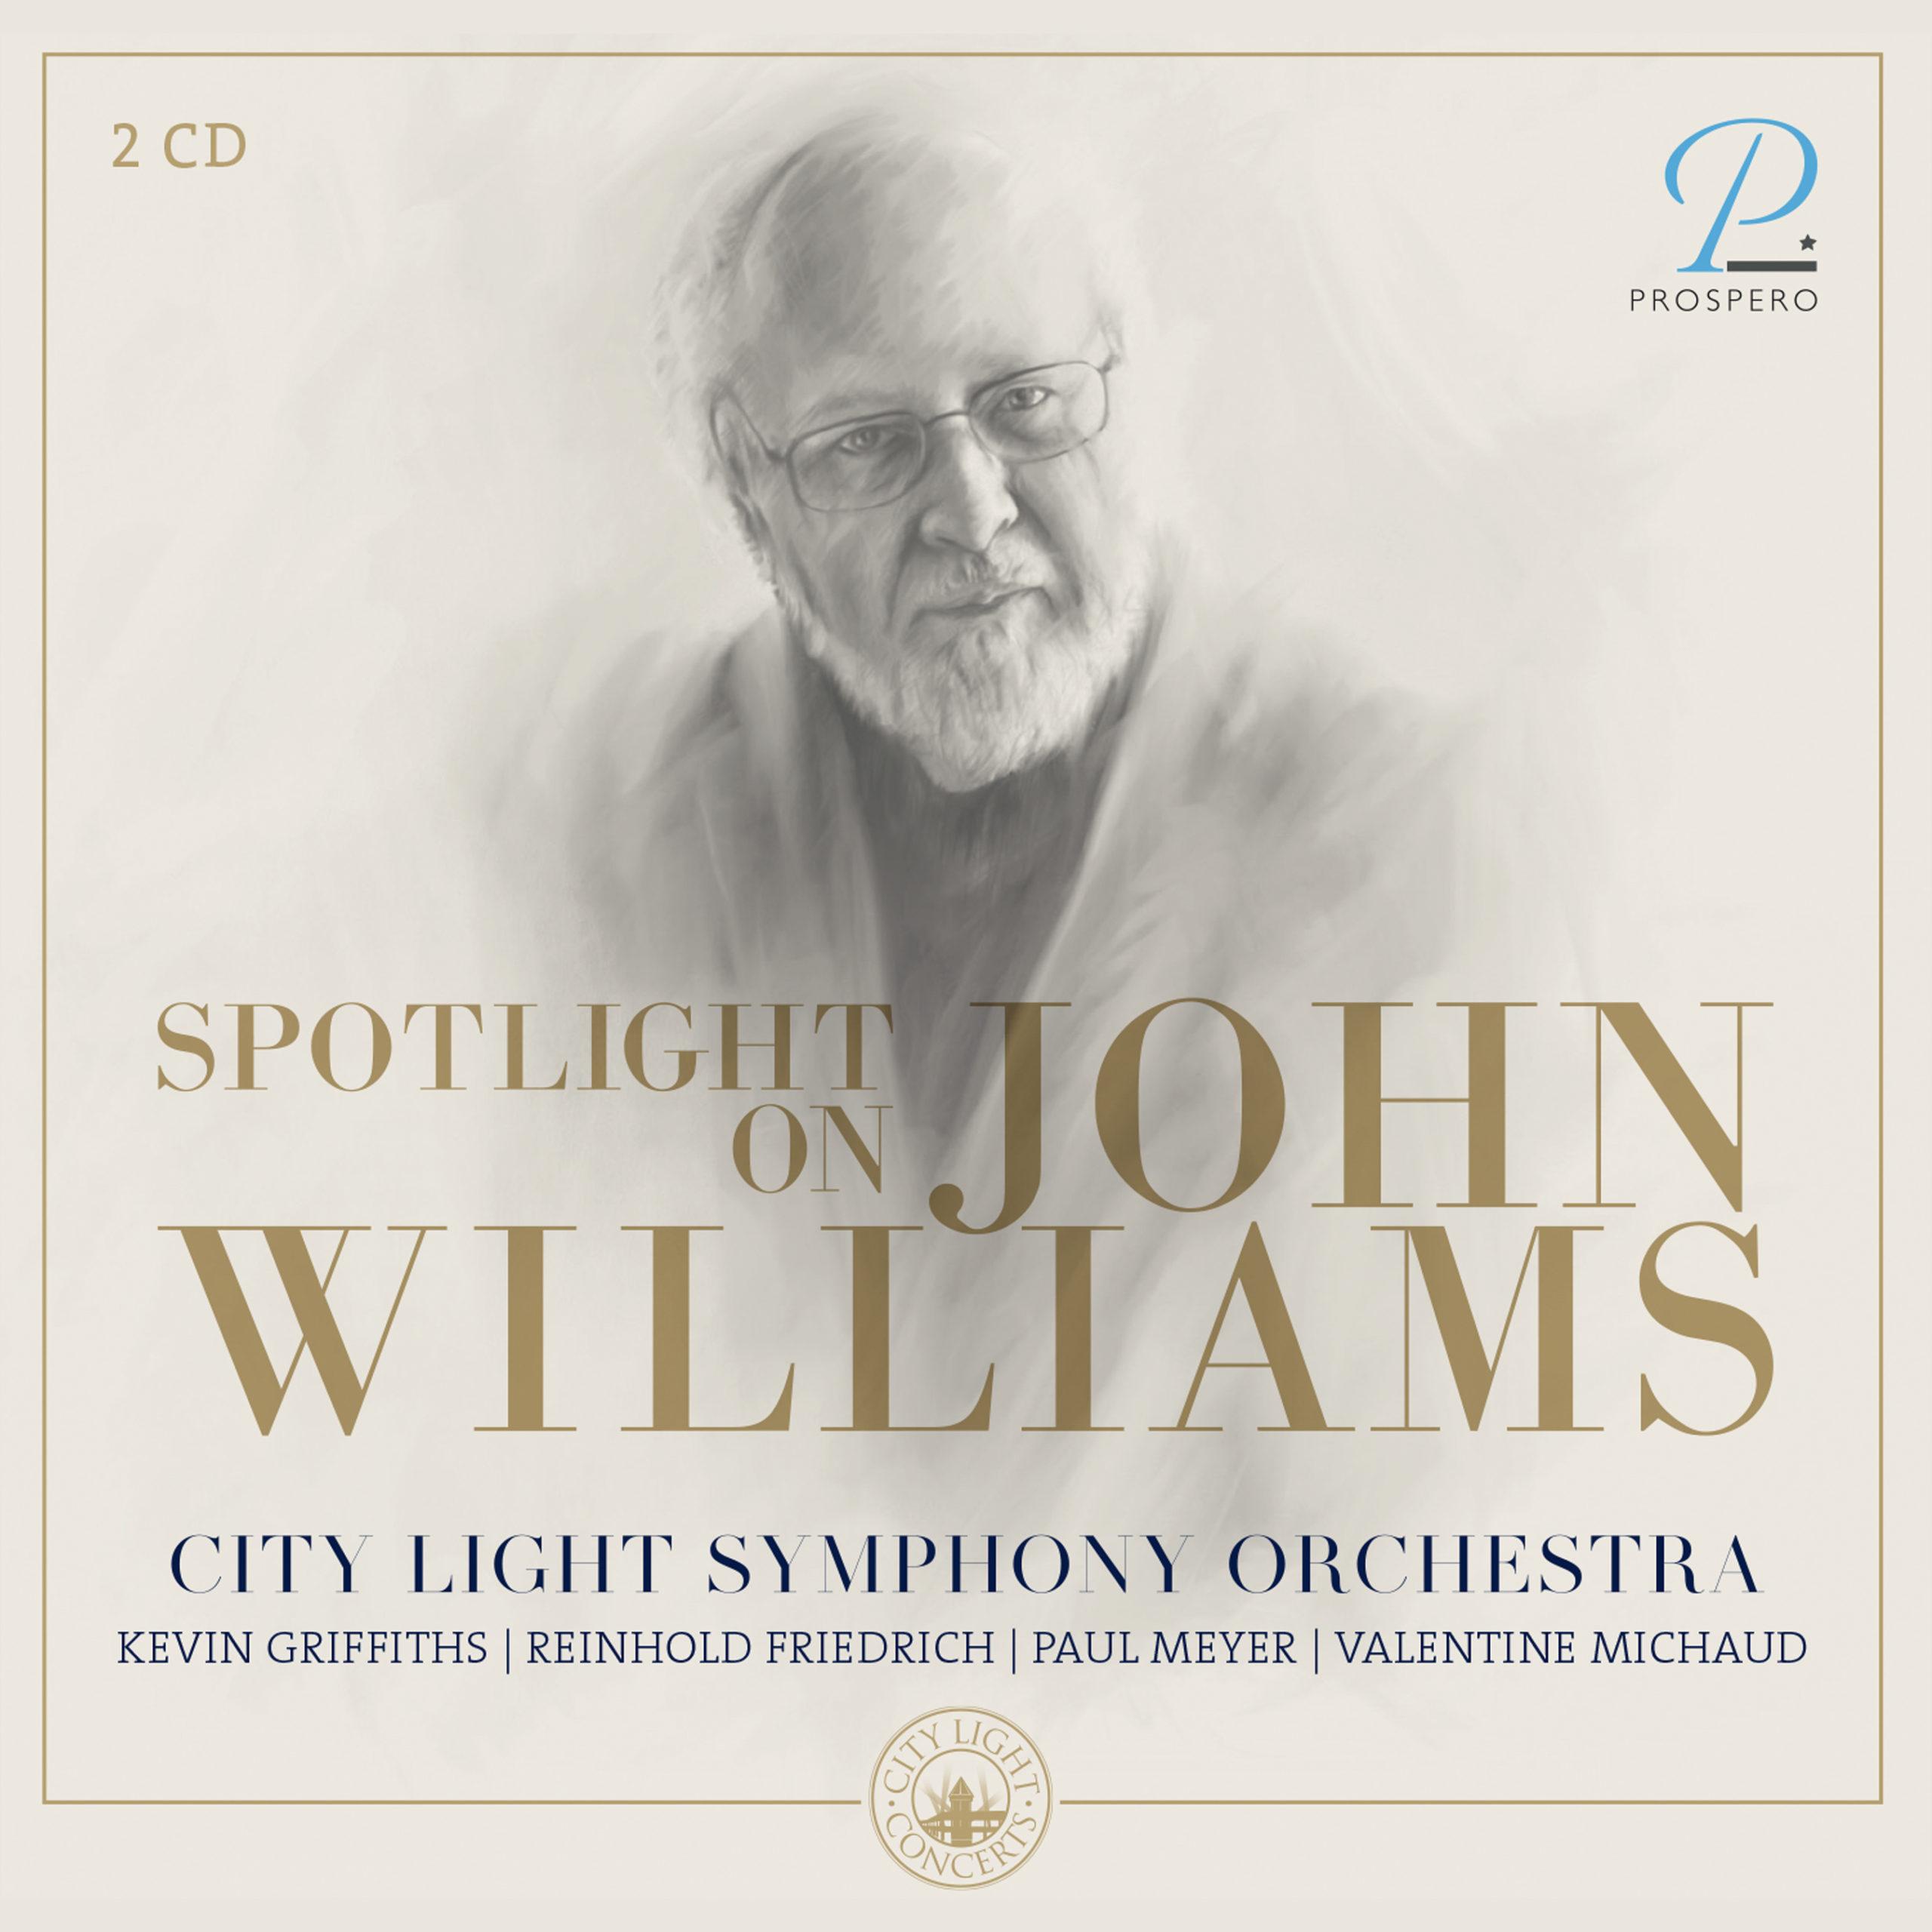 Spotlight on John Williams - Cover Art